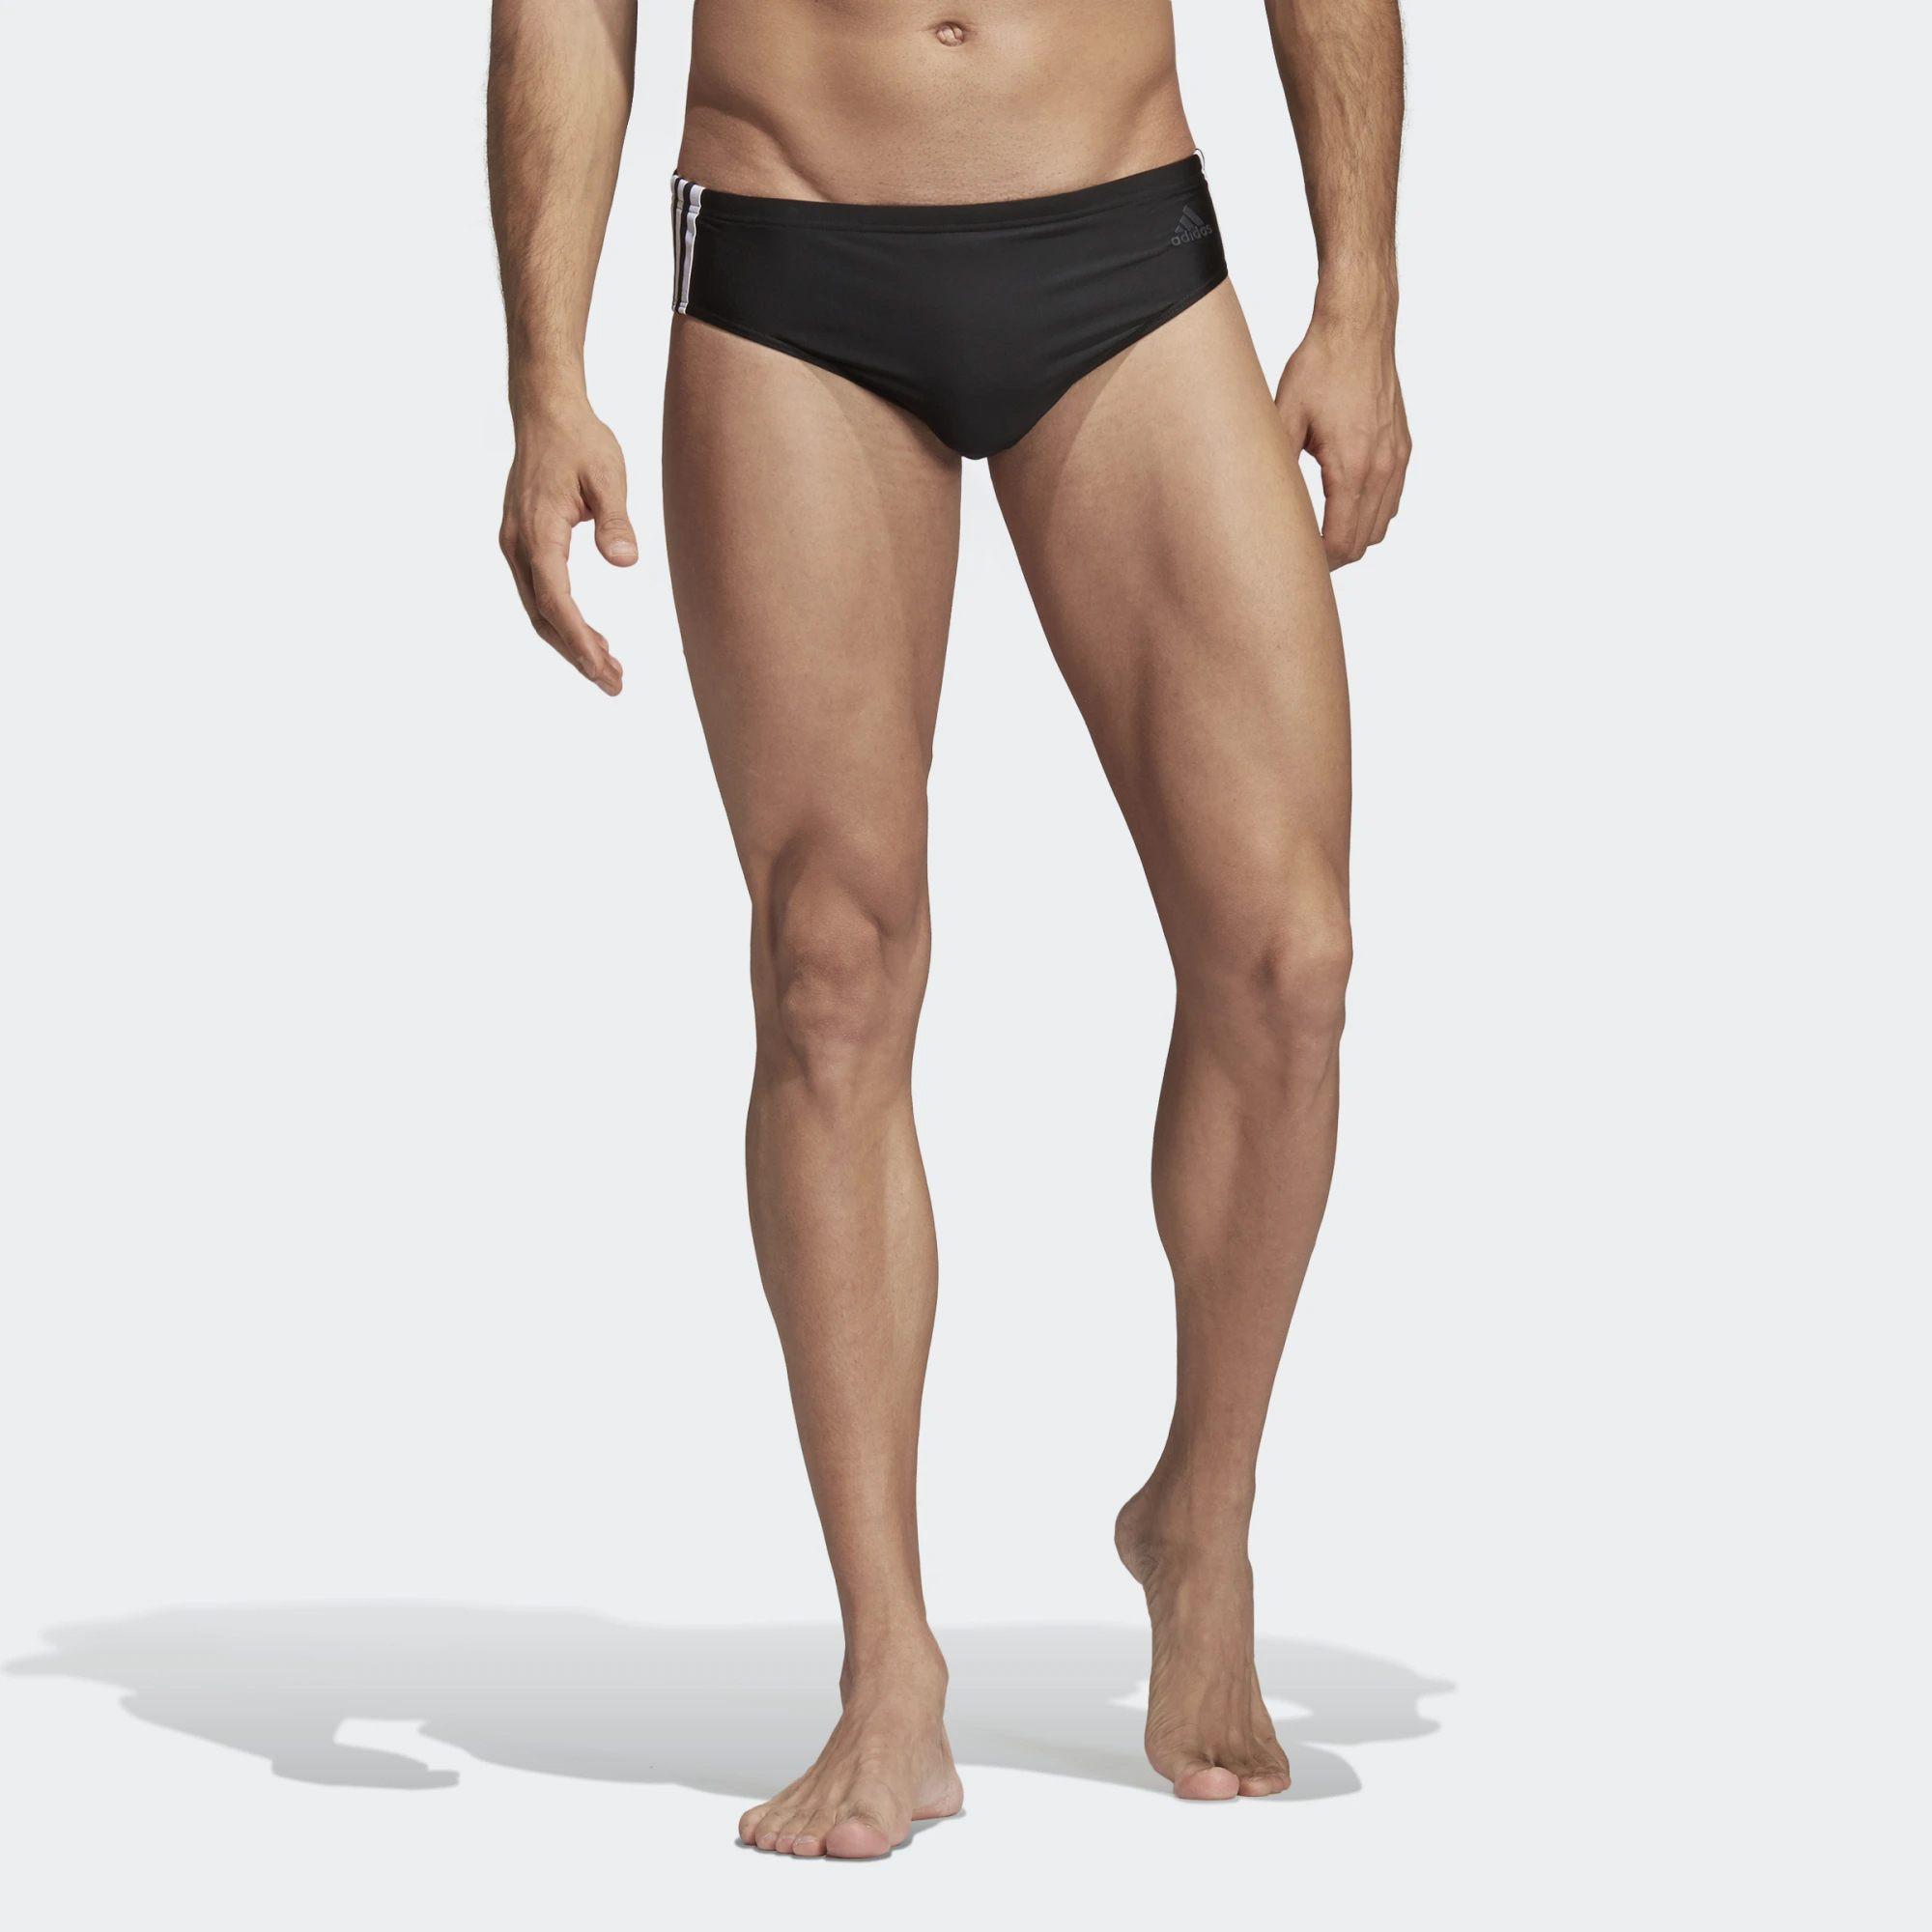 Adidas Fitness 3-Stripes Swim Trunks – Ανδρικό Μαγιό (9000023351_1480)